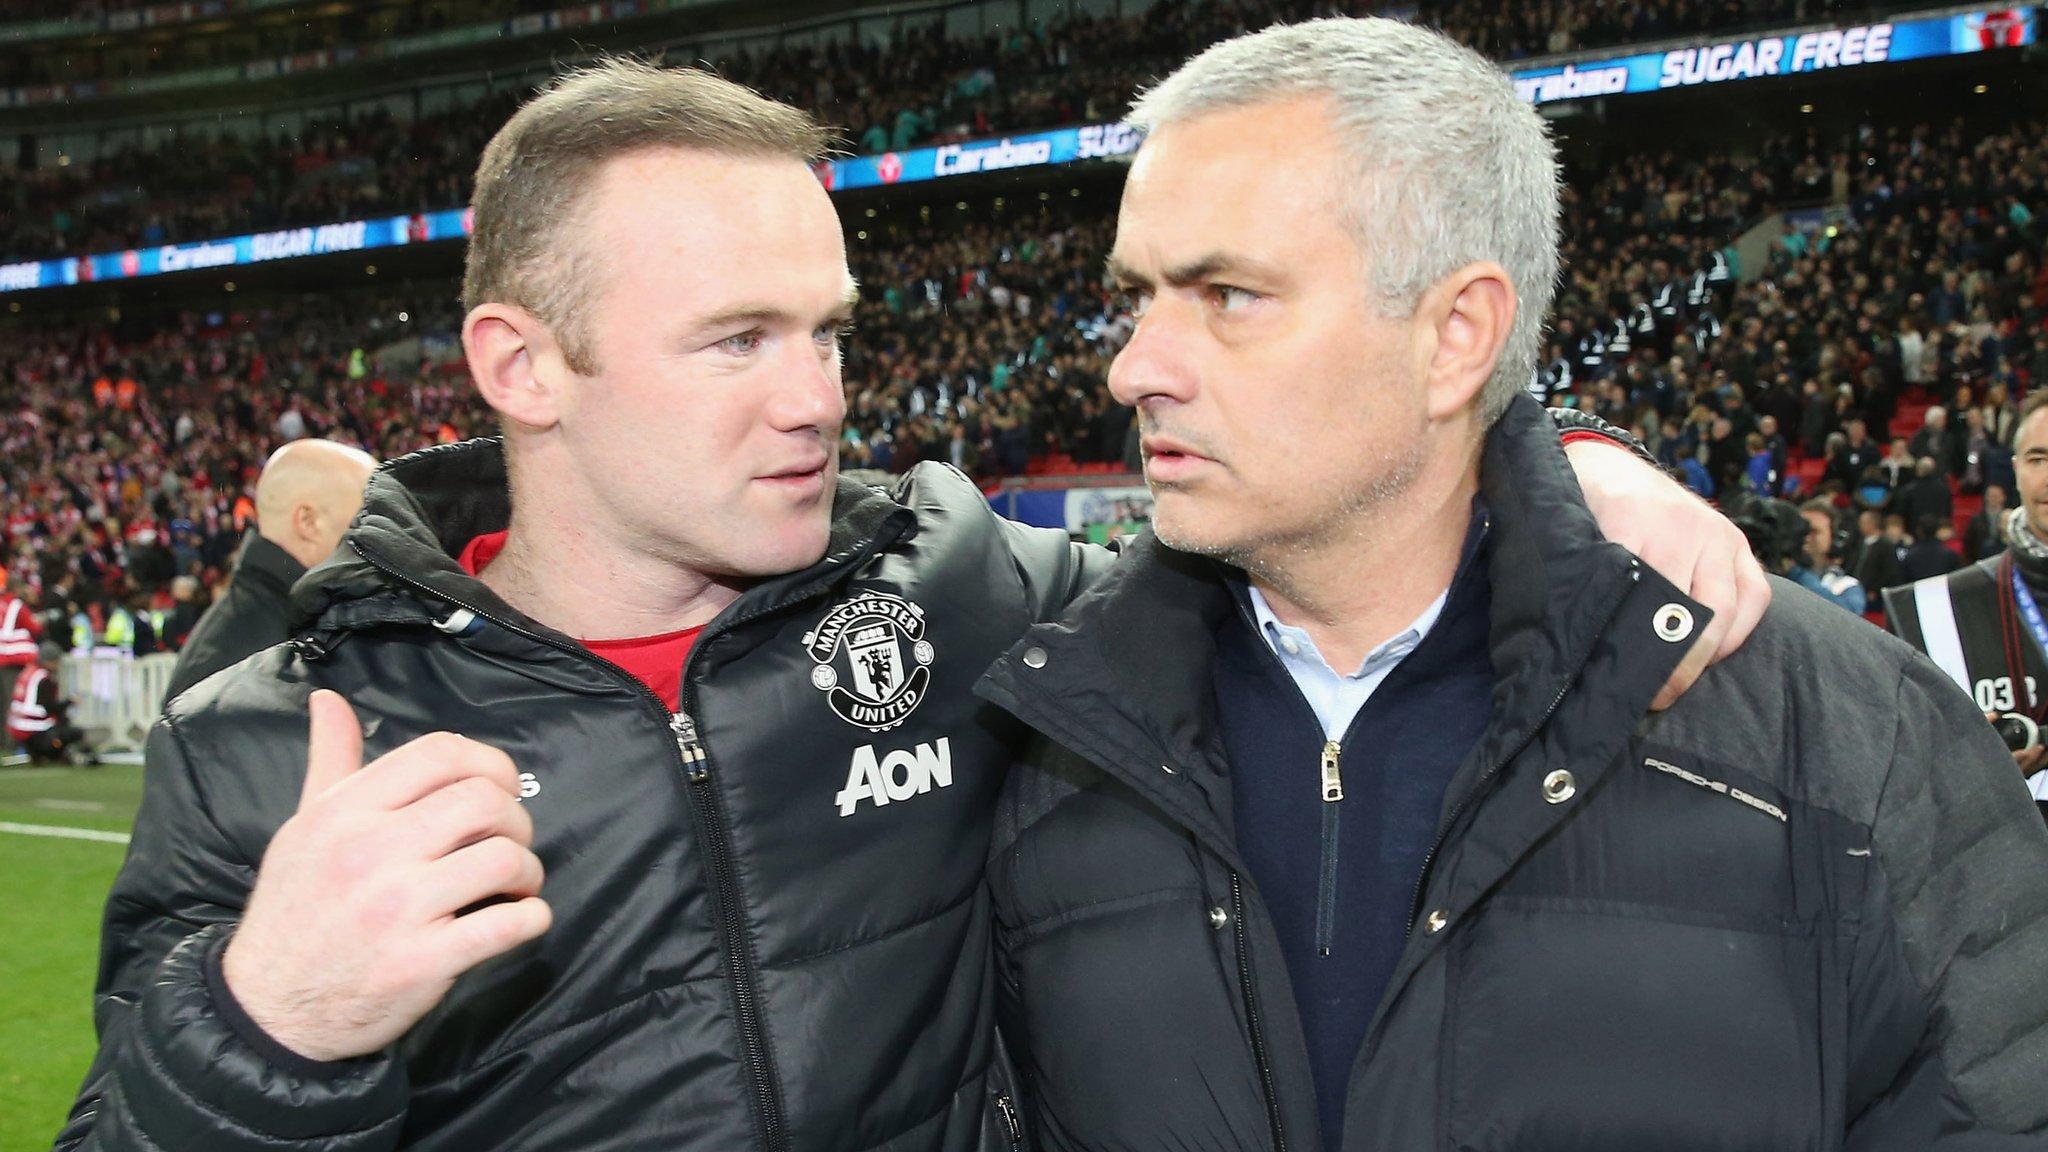 Mourinho's 19 trophies, Pulis' points haul, Kane's killer instinct & Holebas' dirty dozen